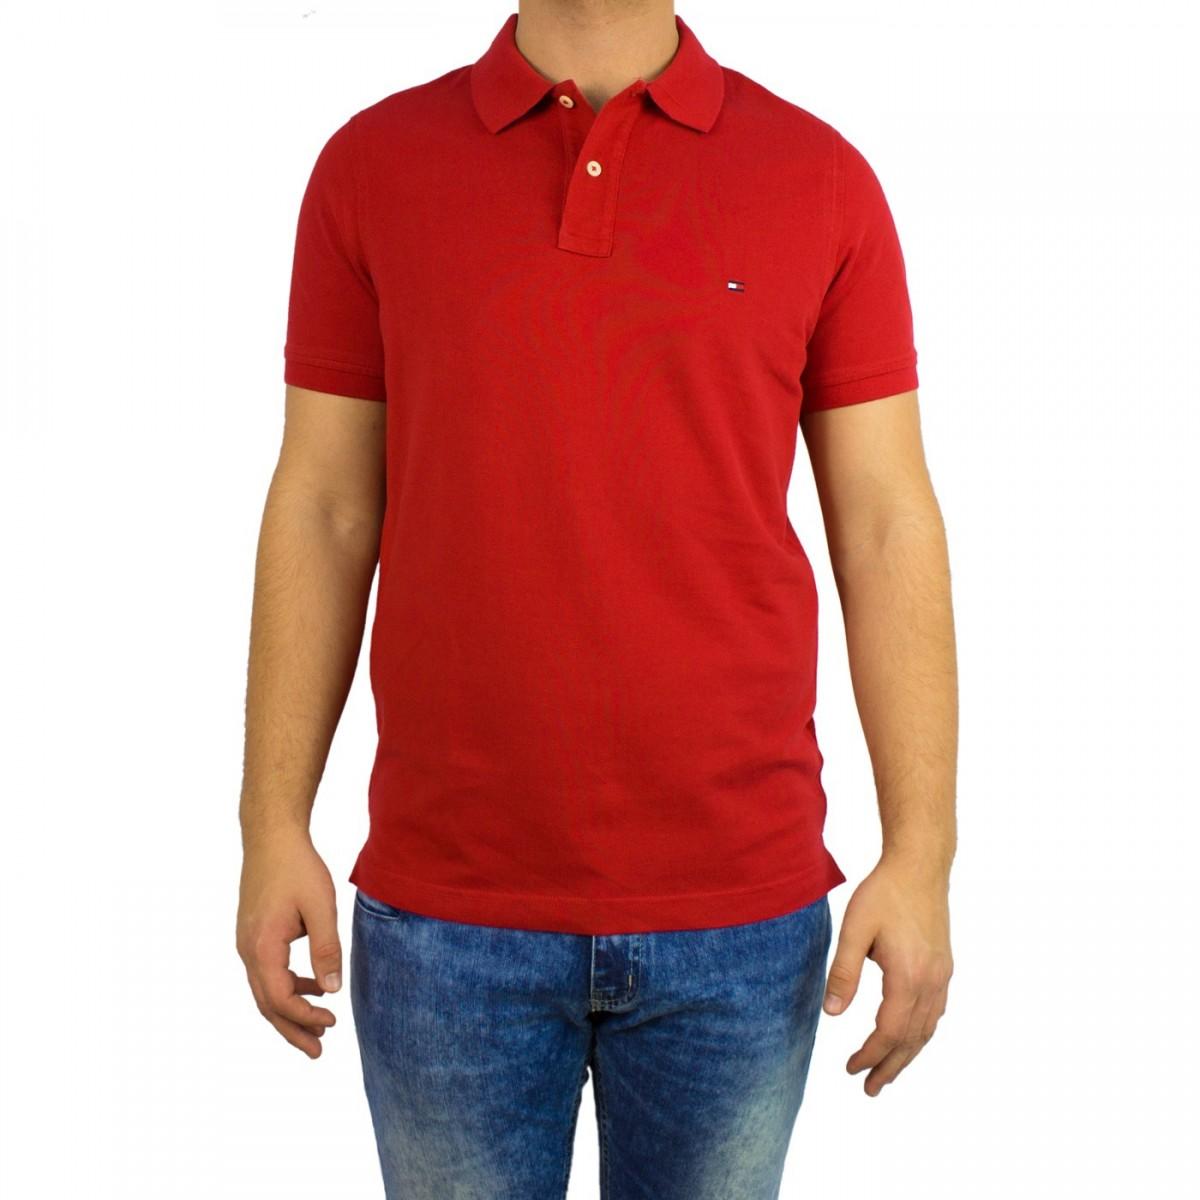 65d68c73c Bizz Store - Camisa Polo Masculina Tommy Hilfiger Slim Fit